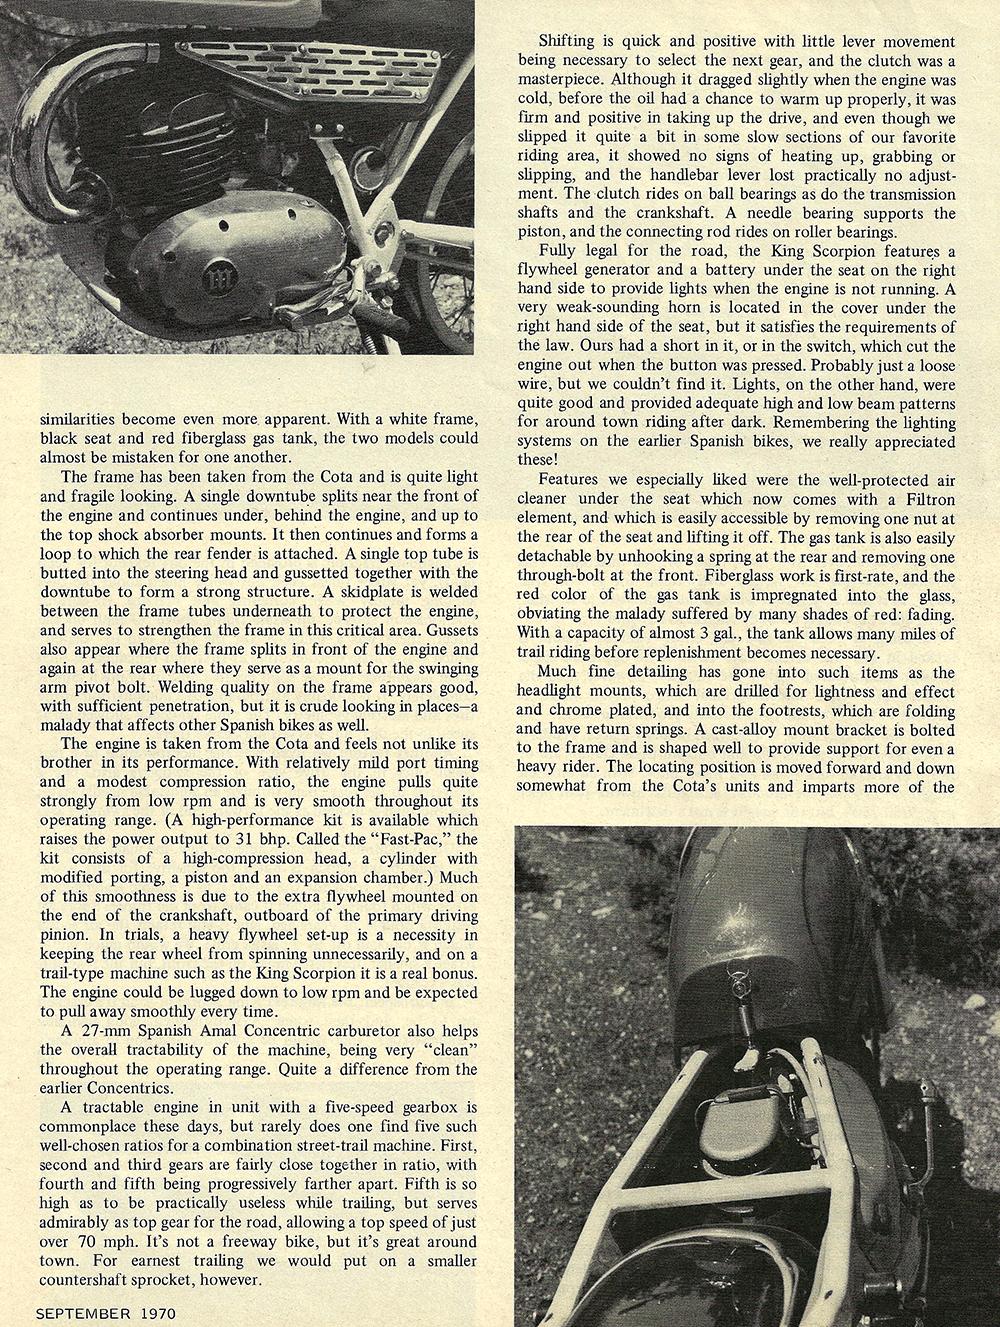 1970 Montesa King Scorpion road test 02.jpg